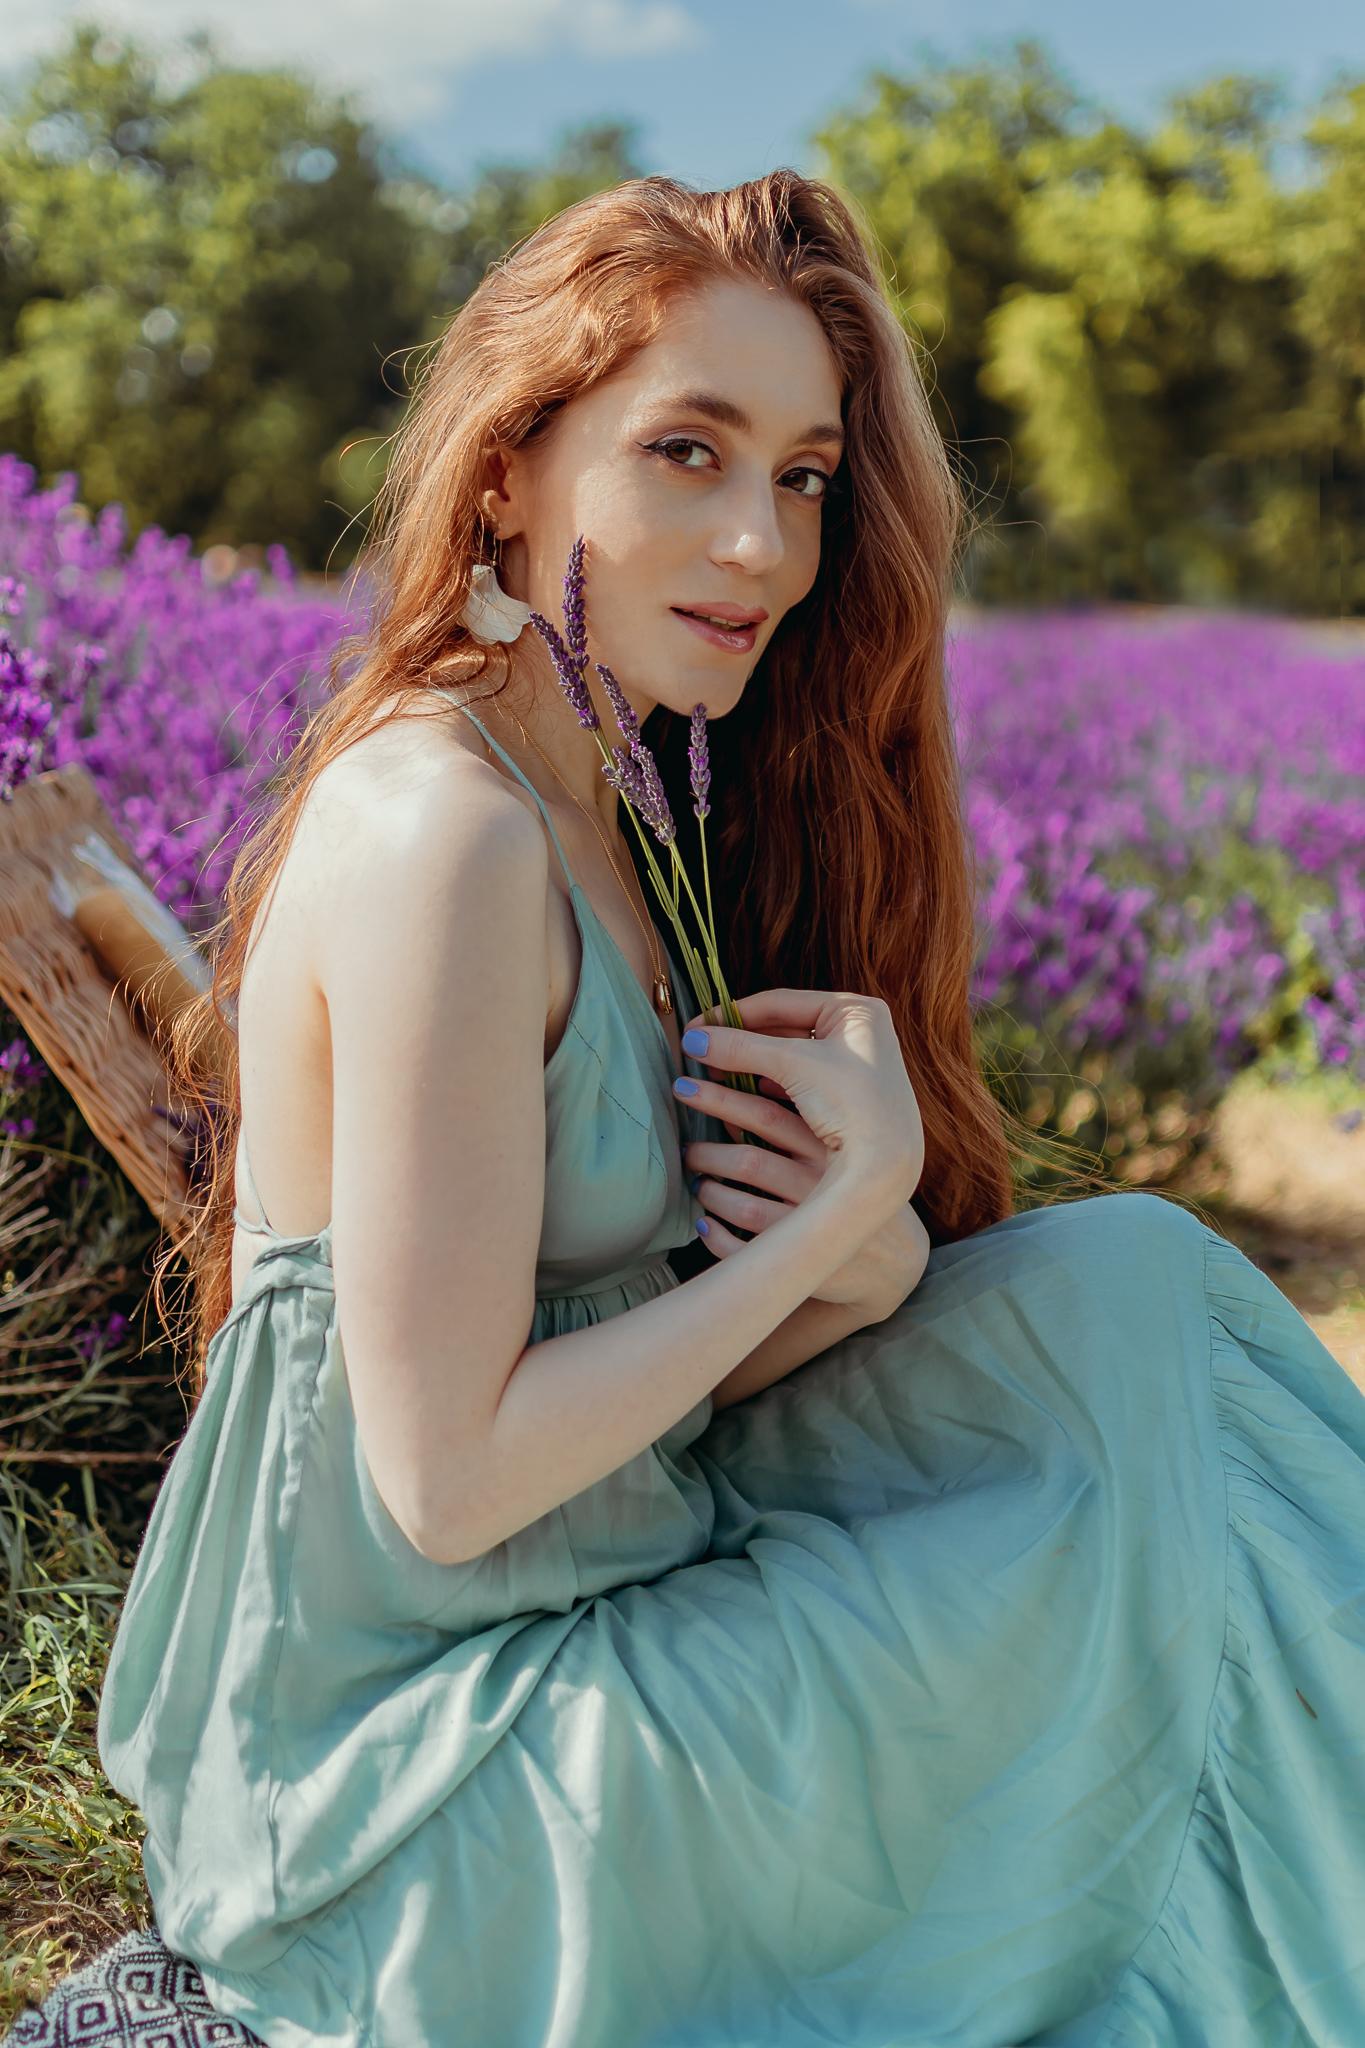 Elizabeth okoh photography-13